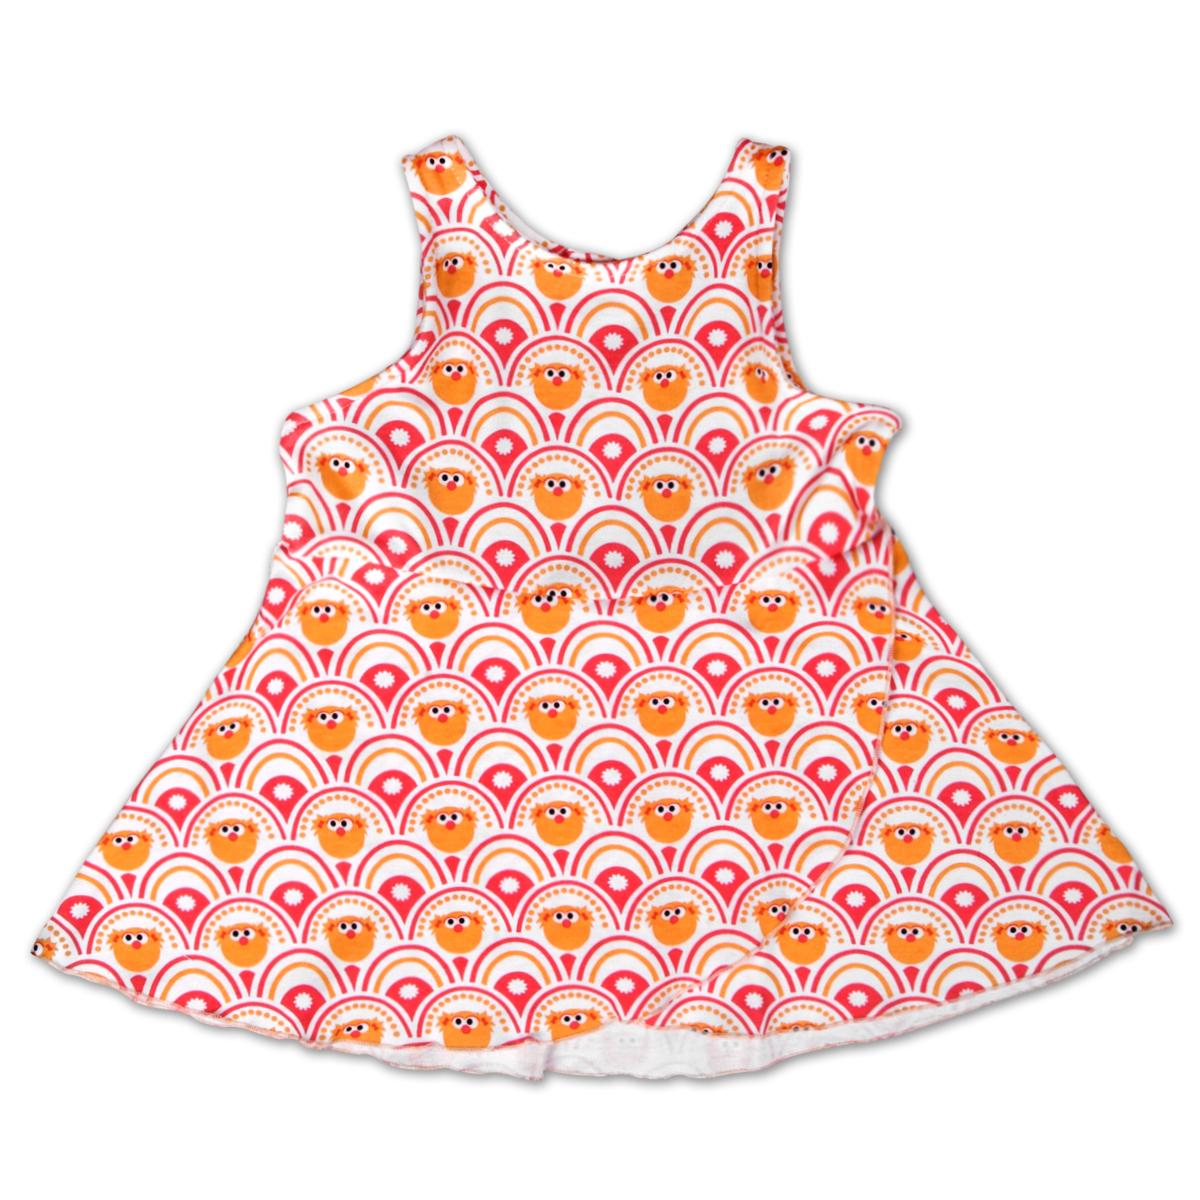 Zoe Blossoms Toddler Flutter Top